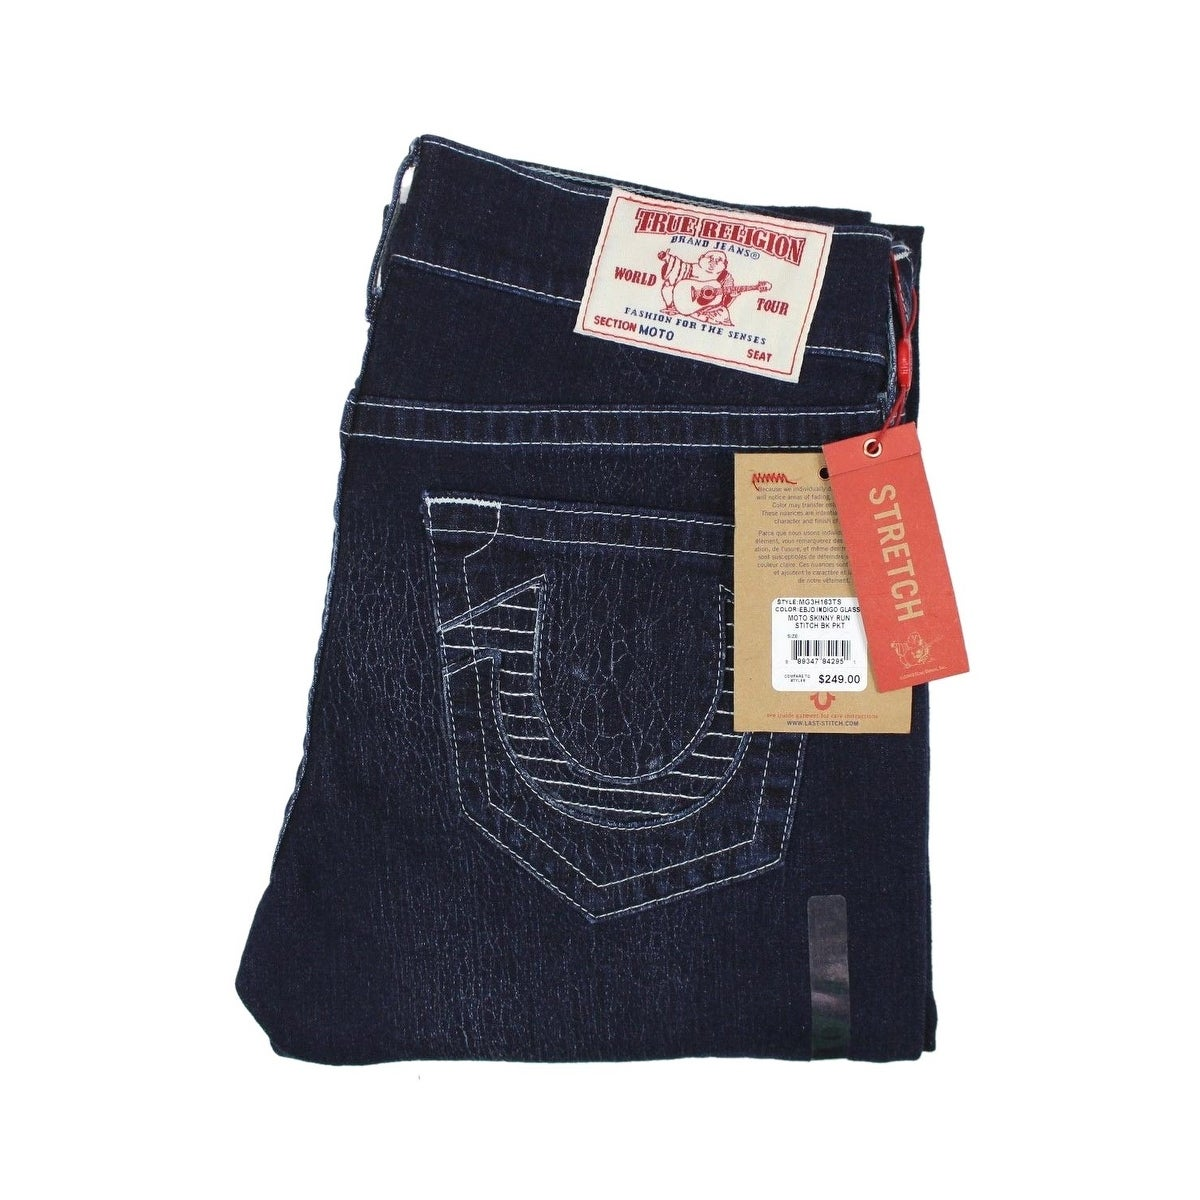 0922742d Shop True Religion Men's Skinny Fit Run Stitch Moto Jeans 34x34 Indigo  Glass - Free Shipping Today - Overstock - 23581772